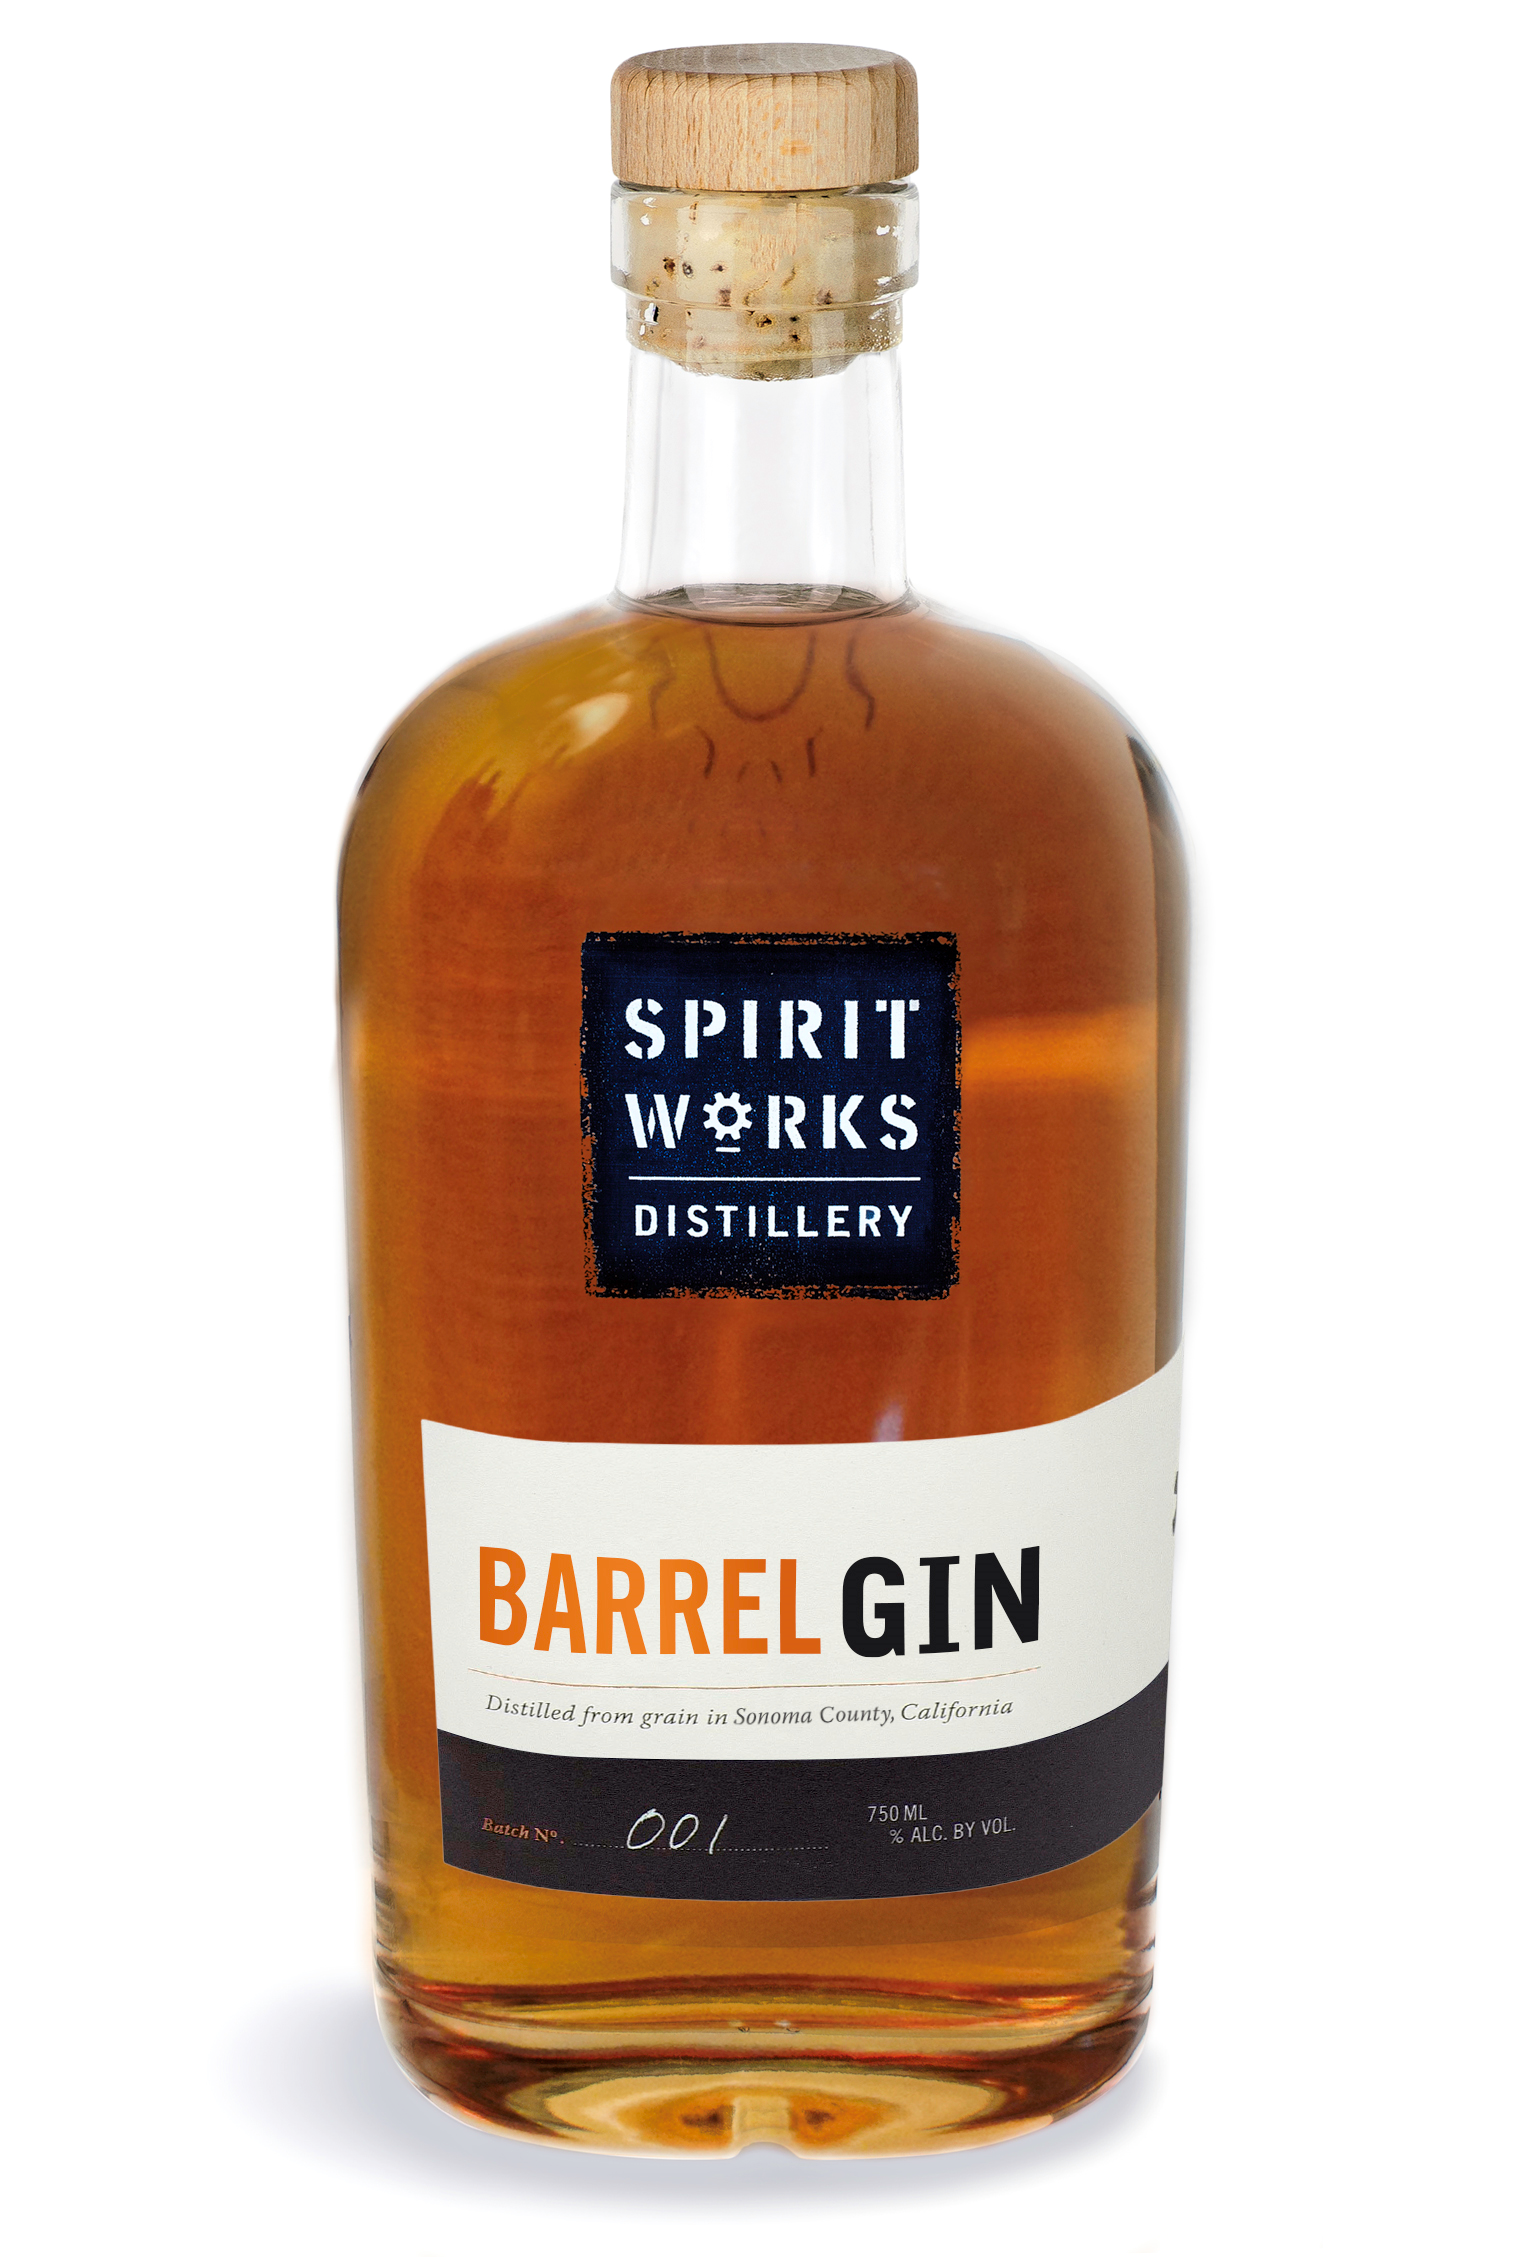 Spirit Works Barrel Gin